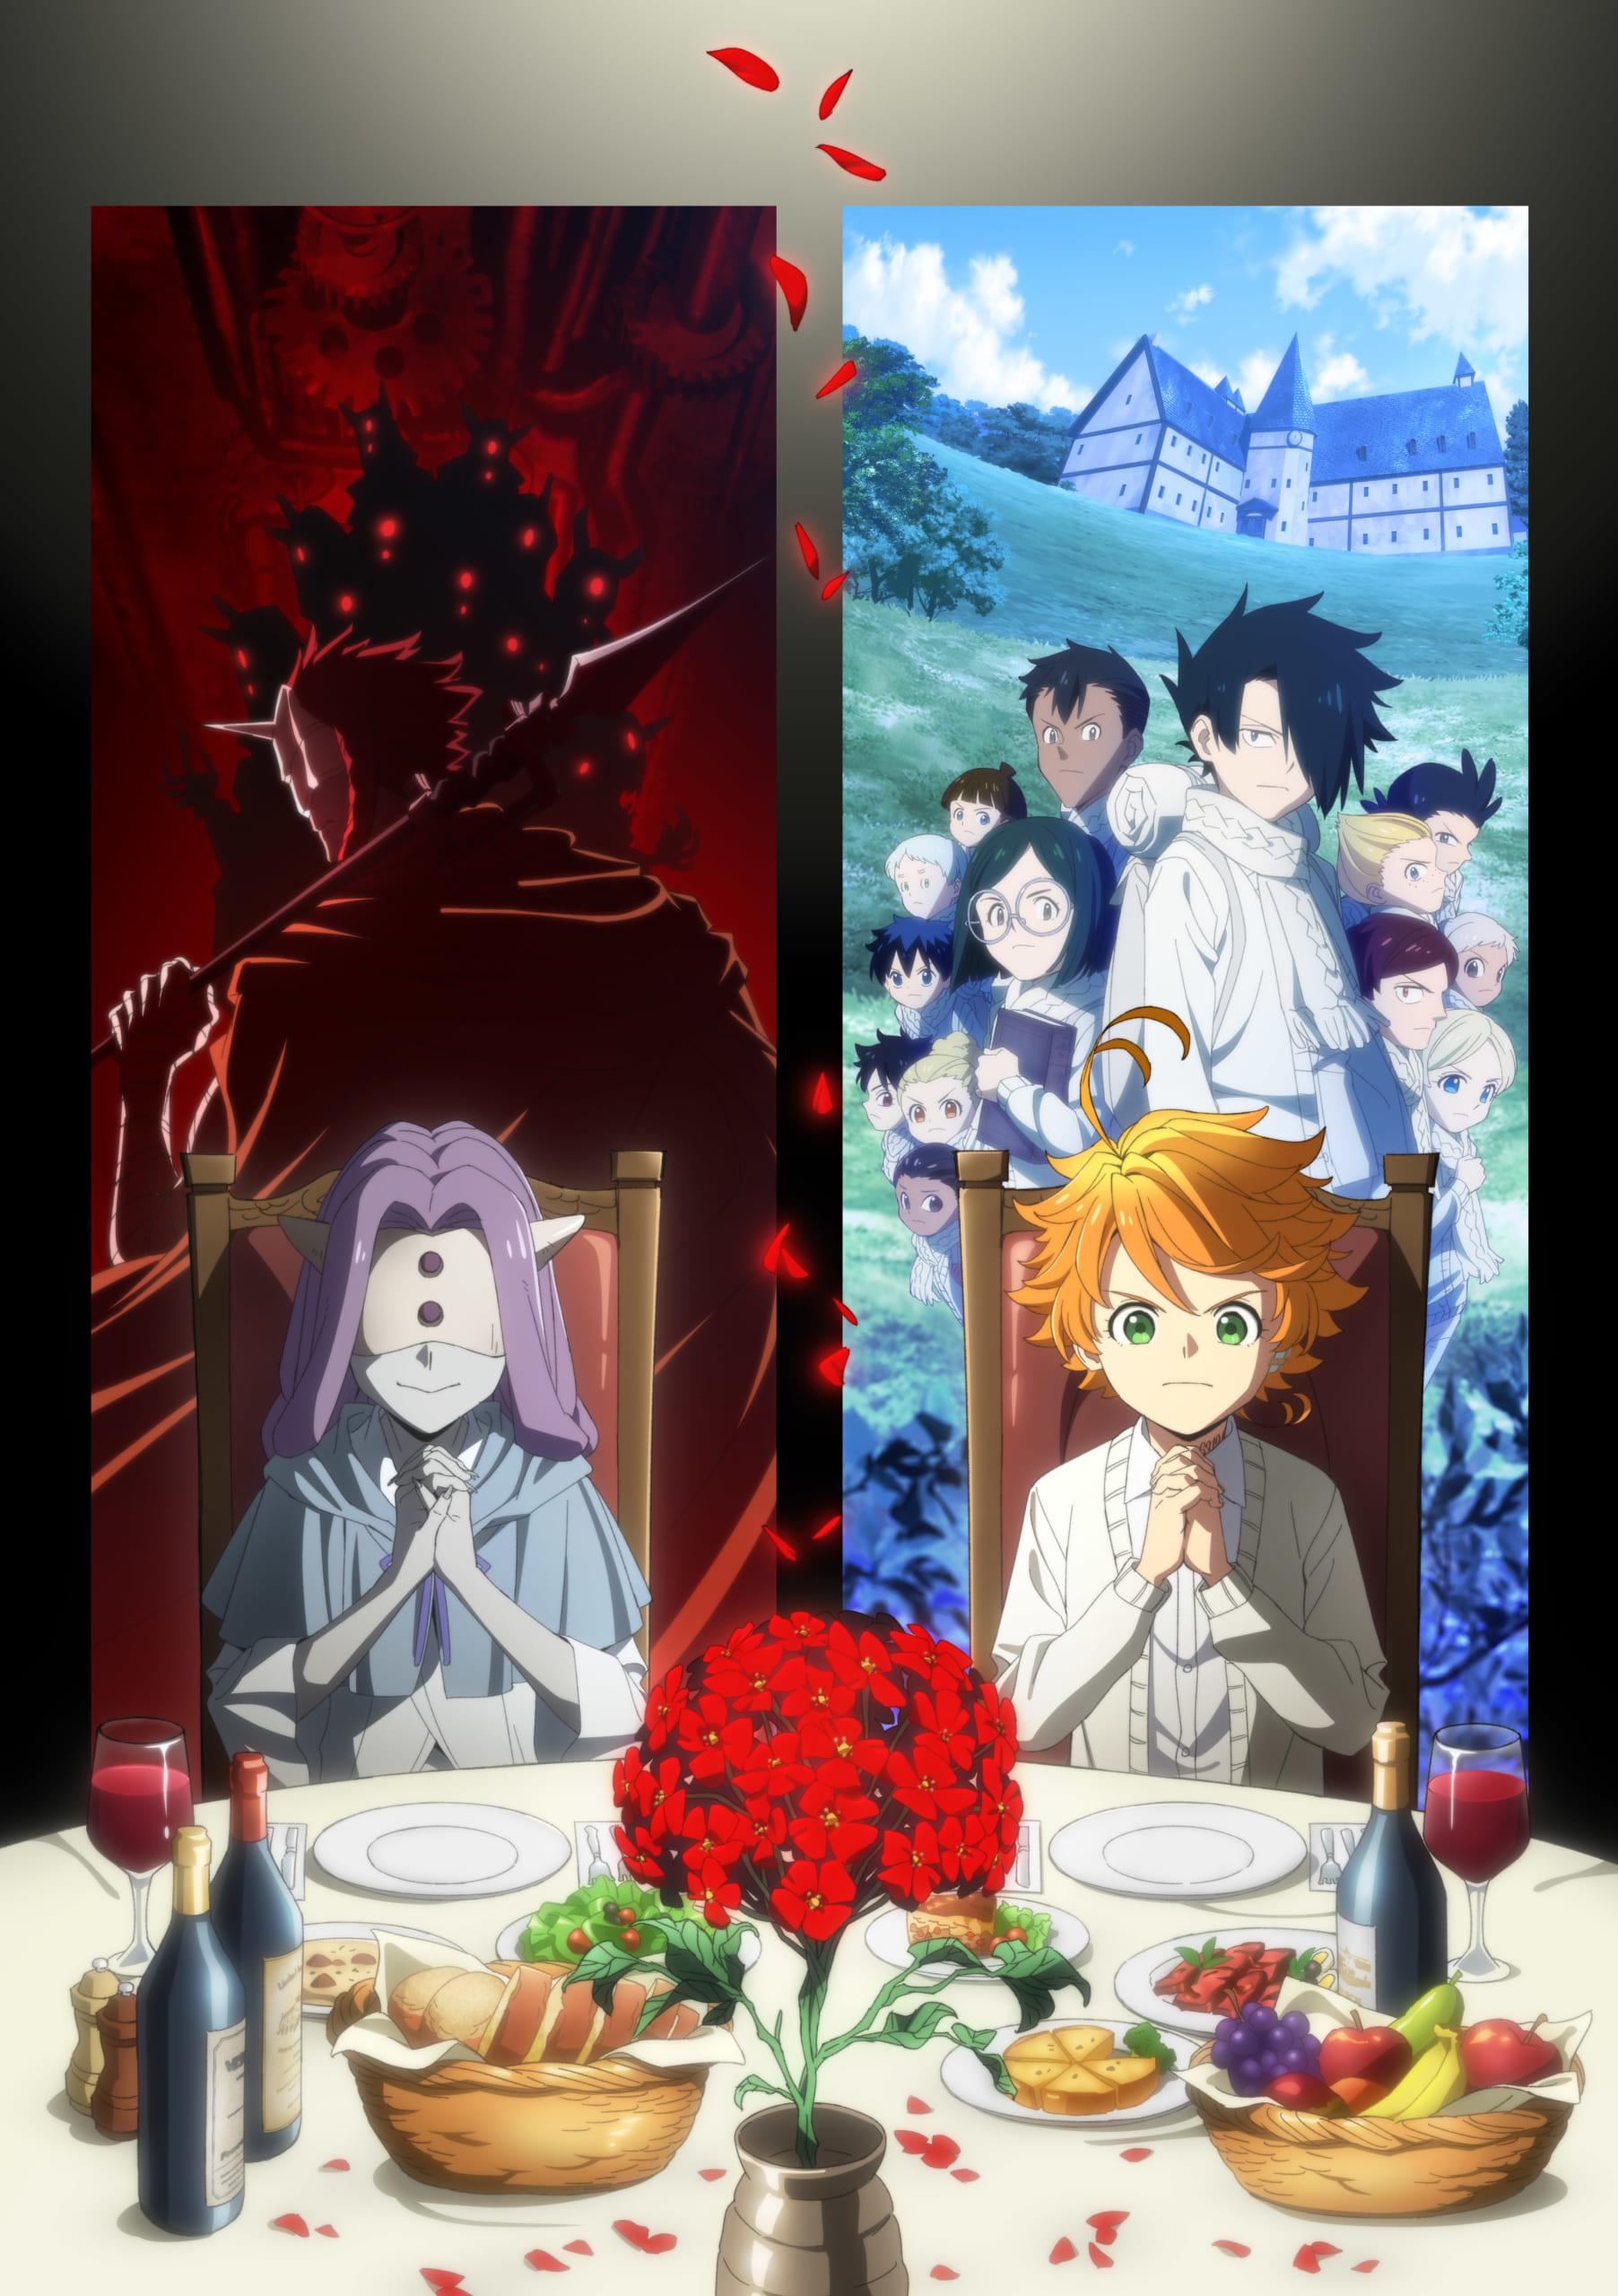 TVアニメ「約束のネバーランド」Season2 キービジュアル